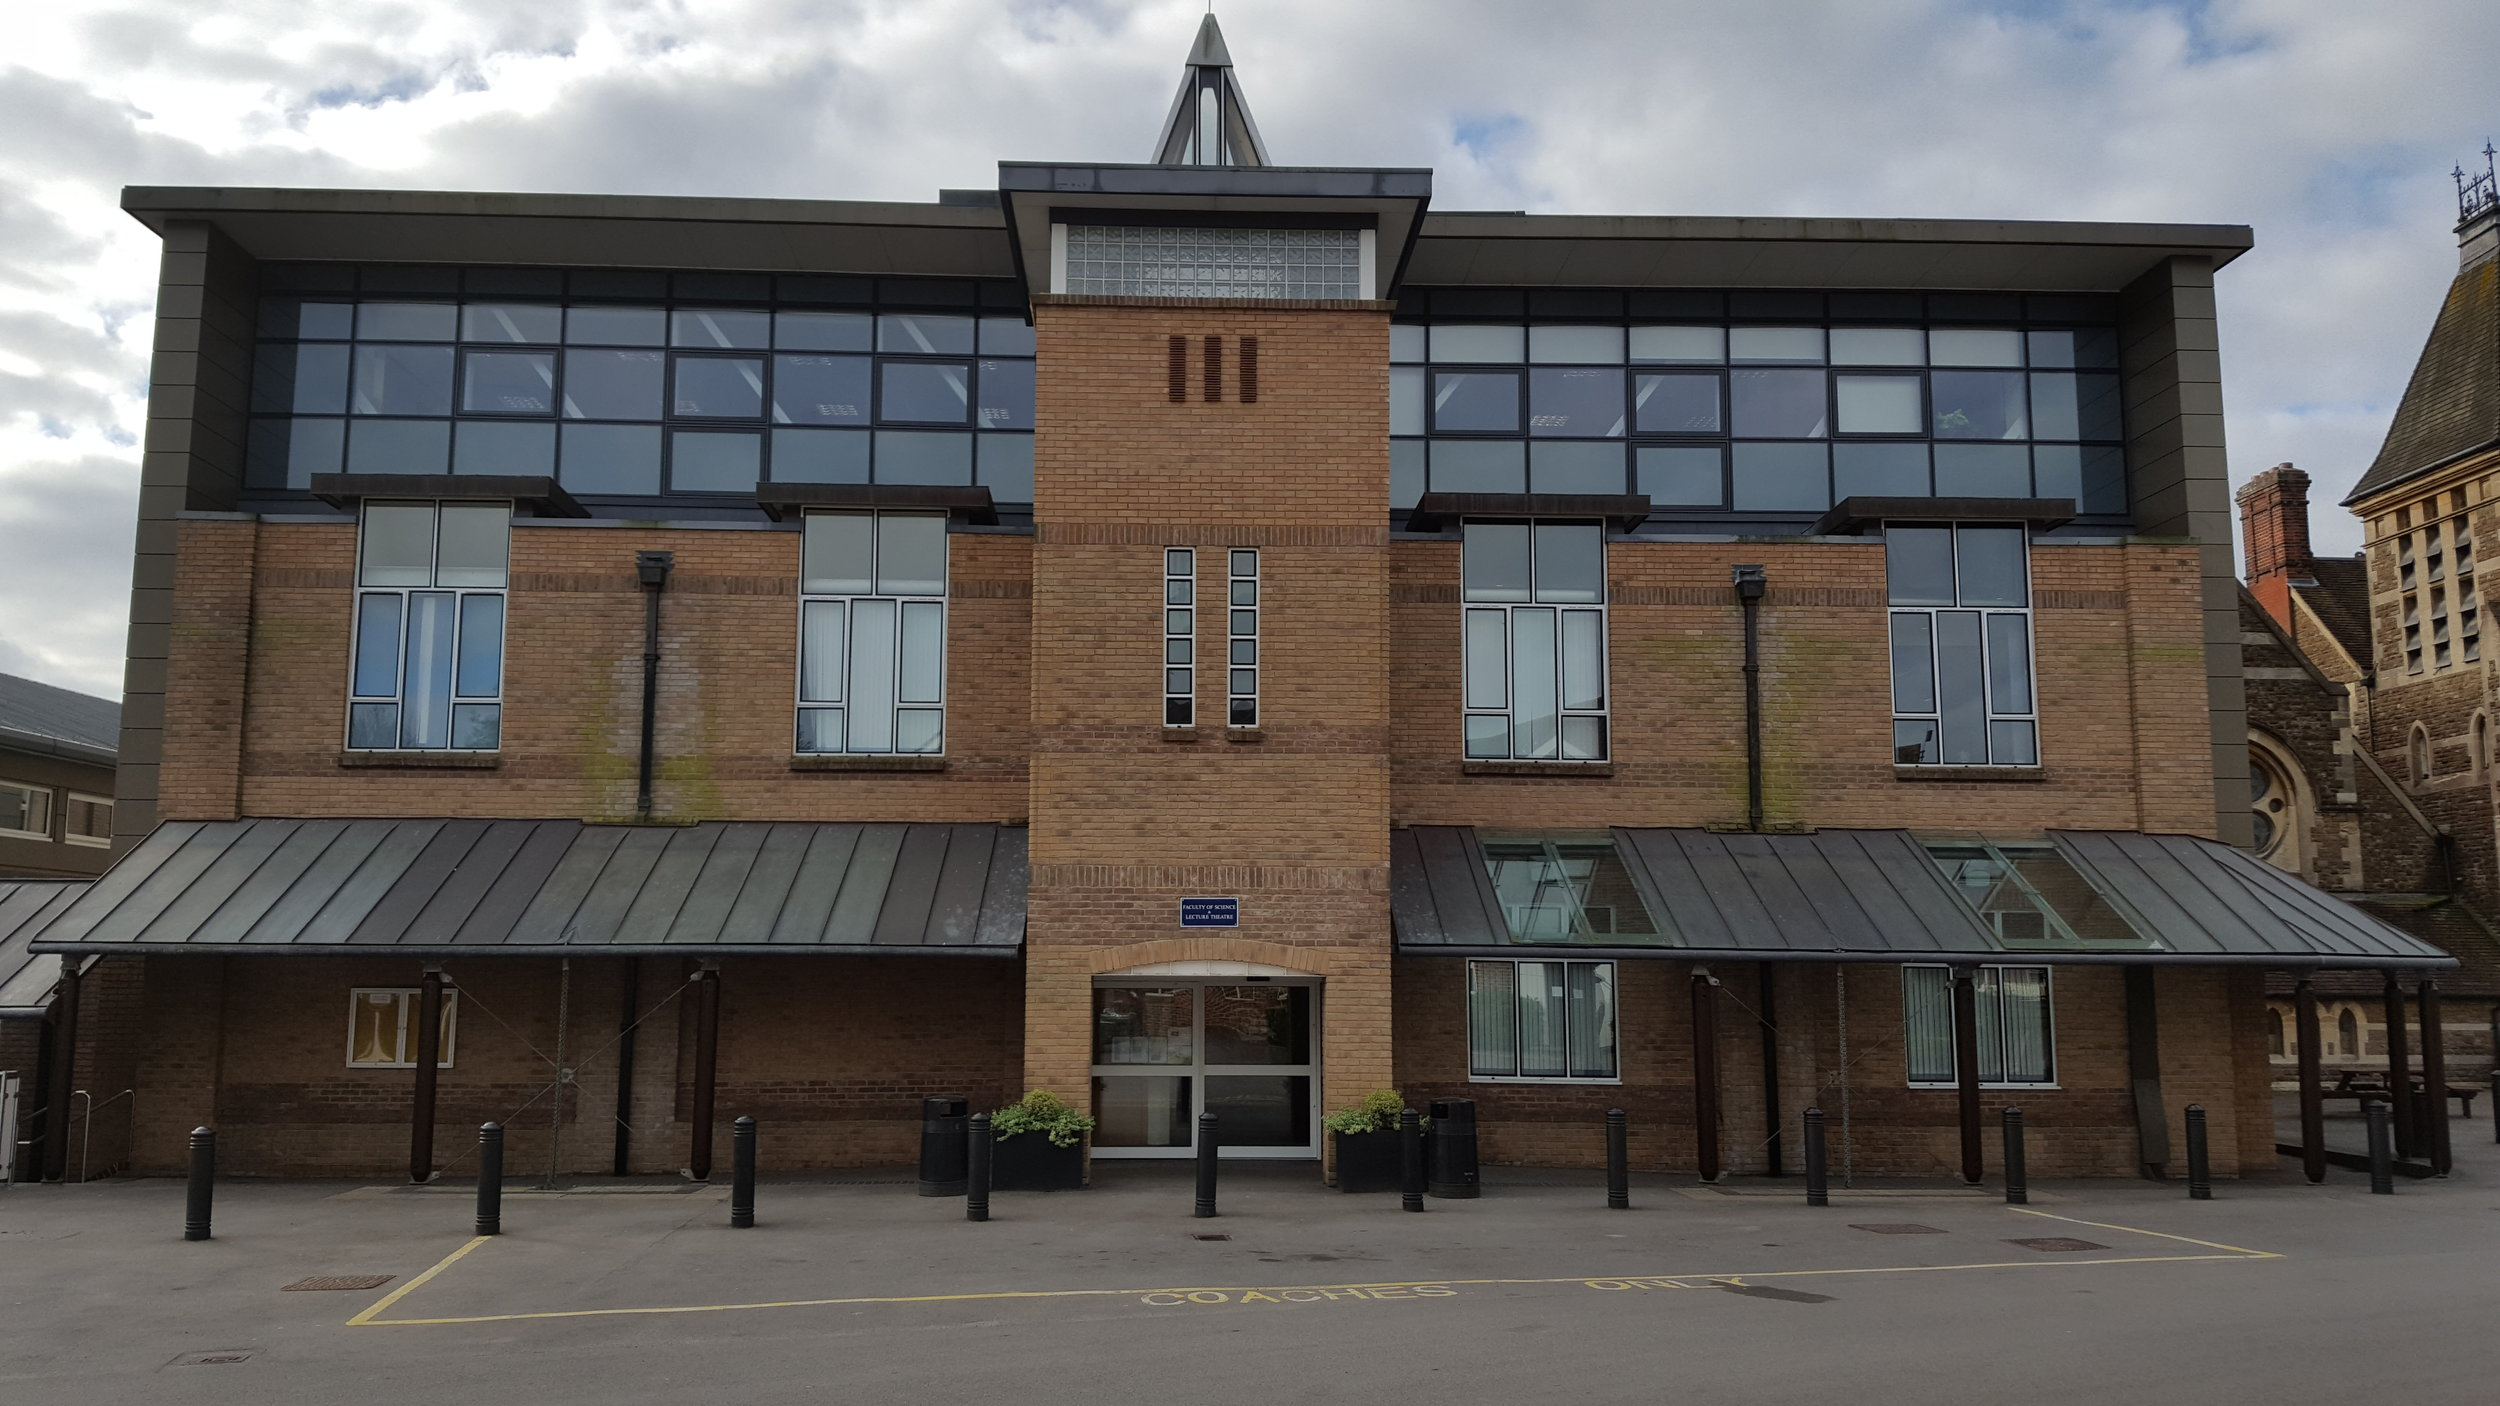 Churcher's College Science Building, Petersfield